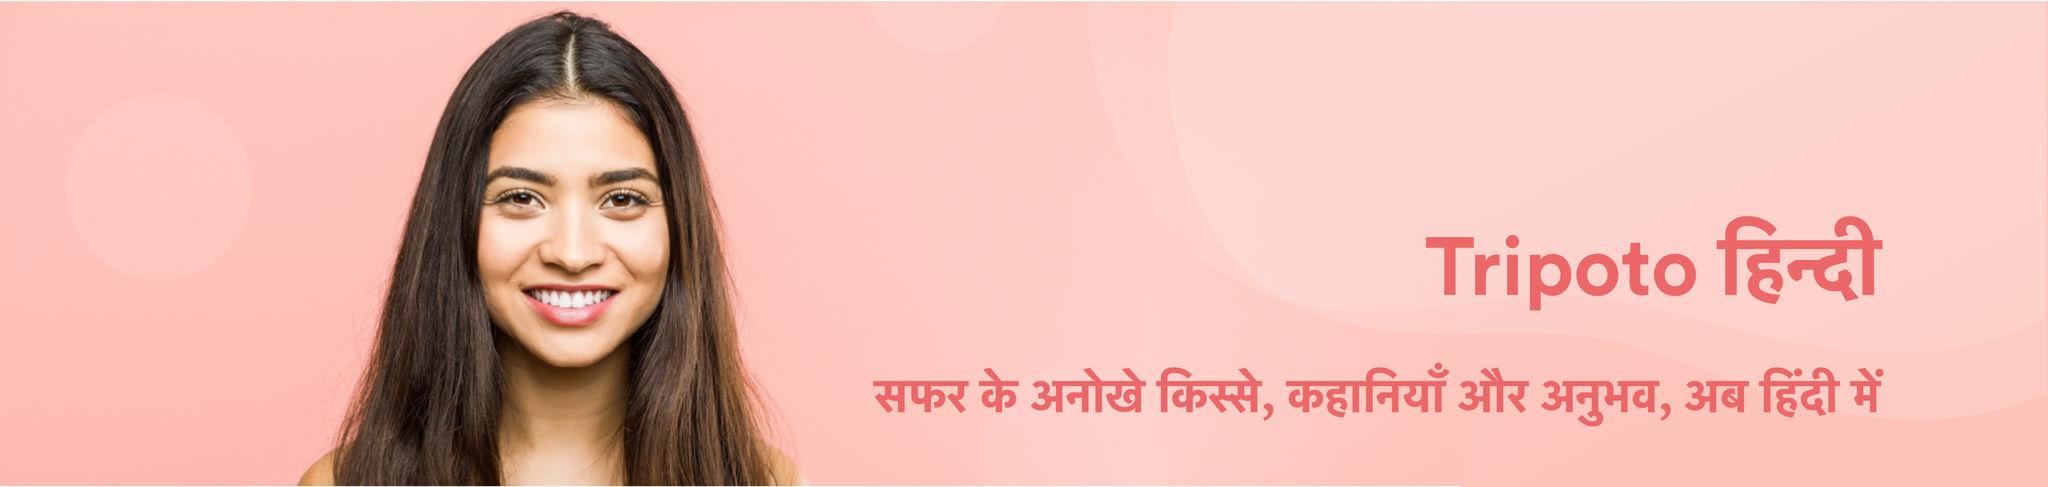 Cover of Tripoto हिंदी